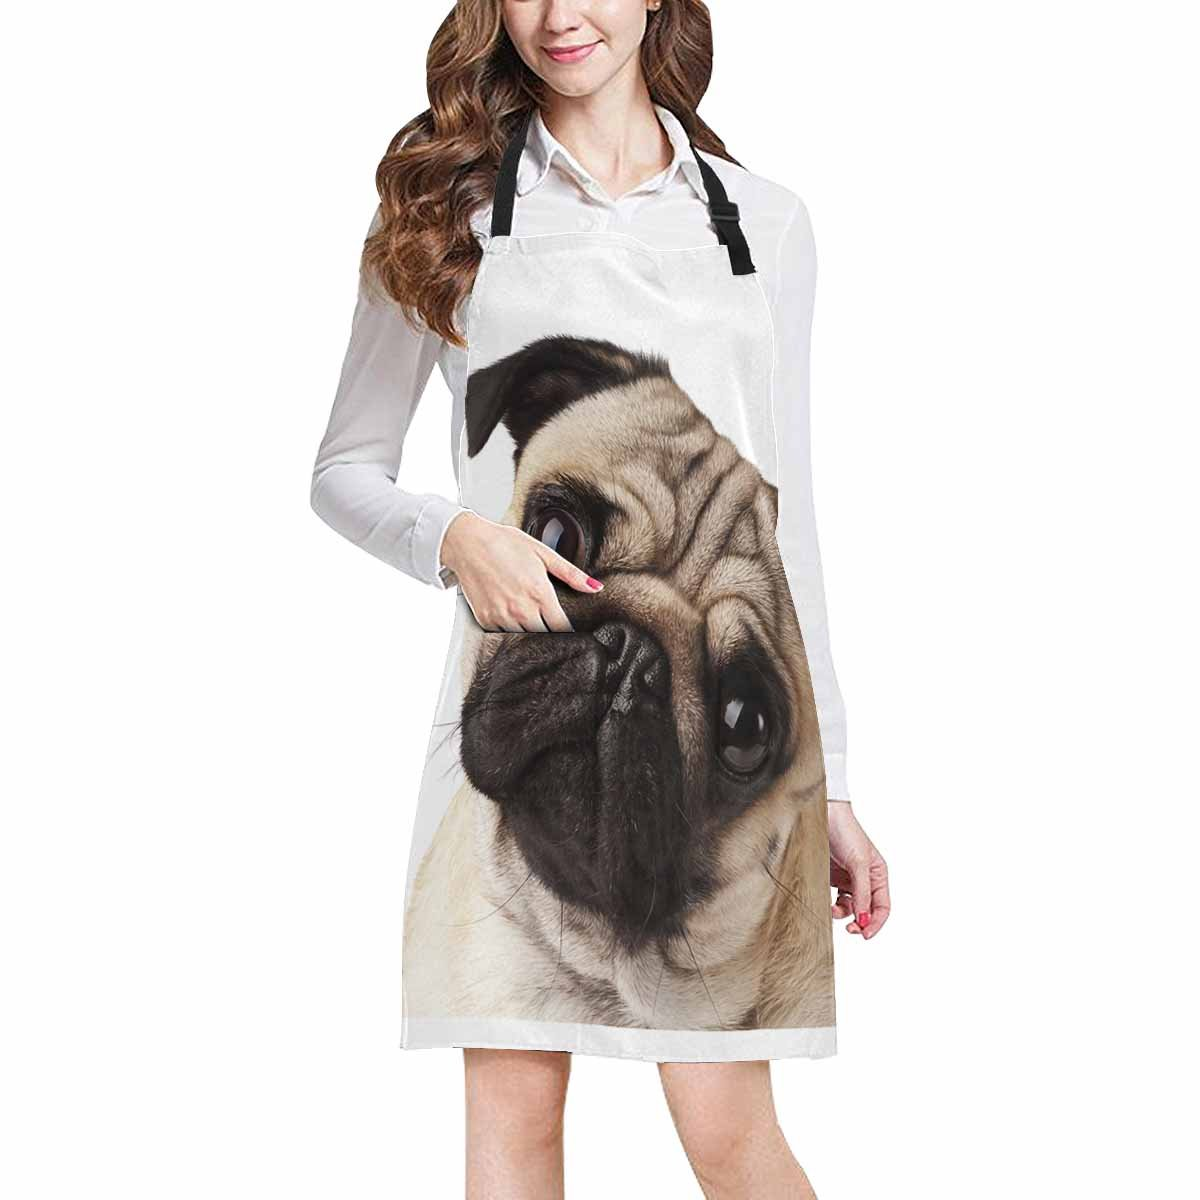 InterestPrint Close-Up Pug Dog Apron for Women Men Girls Chef with Pockets, Lovely Animal Unisex Adjustable Bib Apron Kitchen for Cooking Baking Gardening Home by InterestPrint (Image #2)